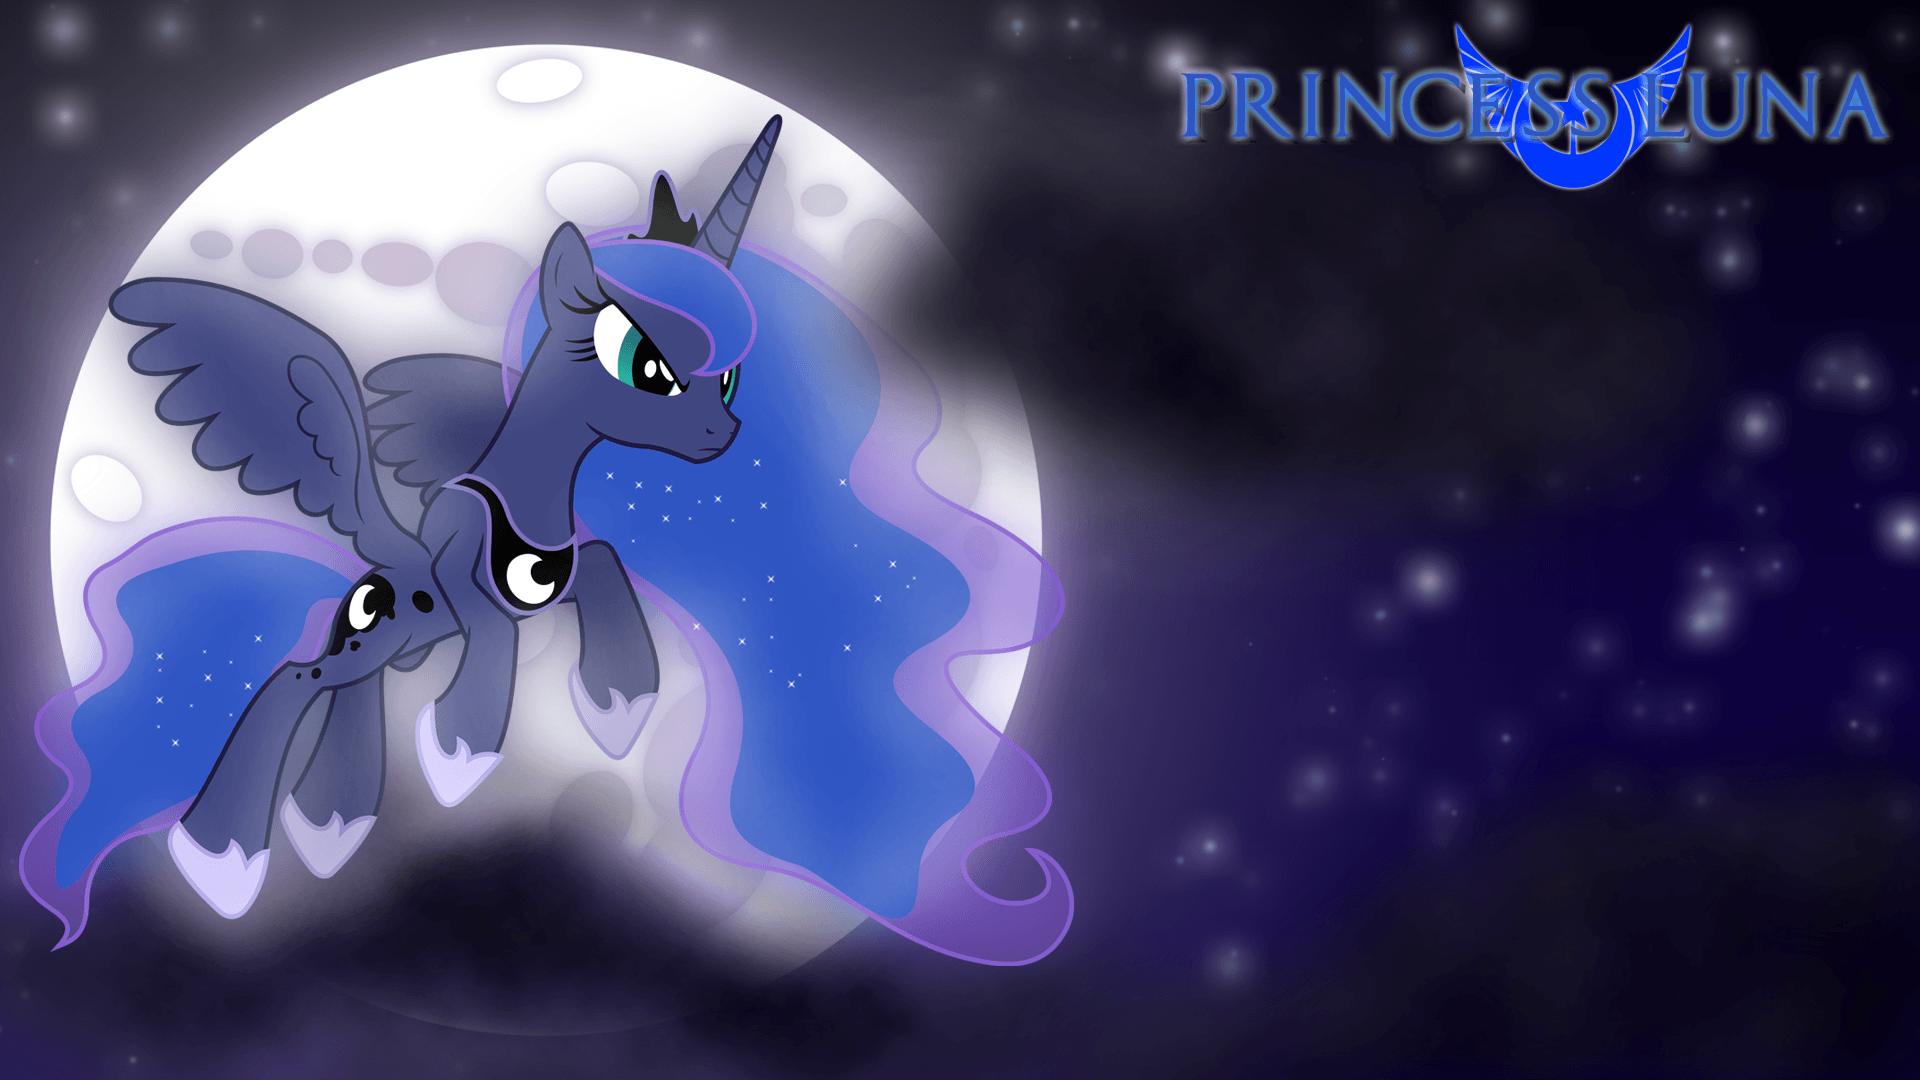 blinking princess luna wallpaper - photo #12